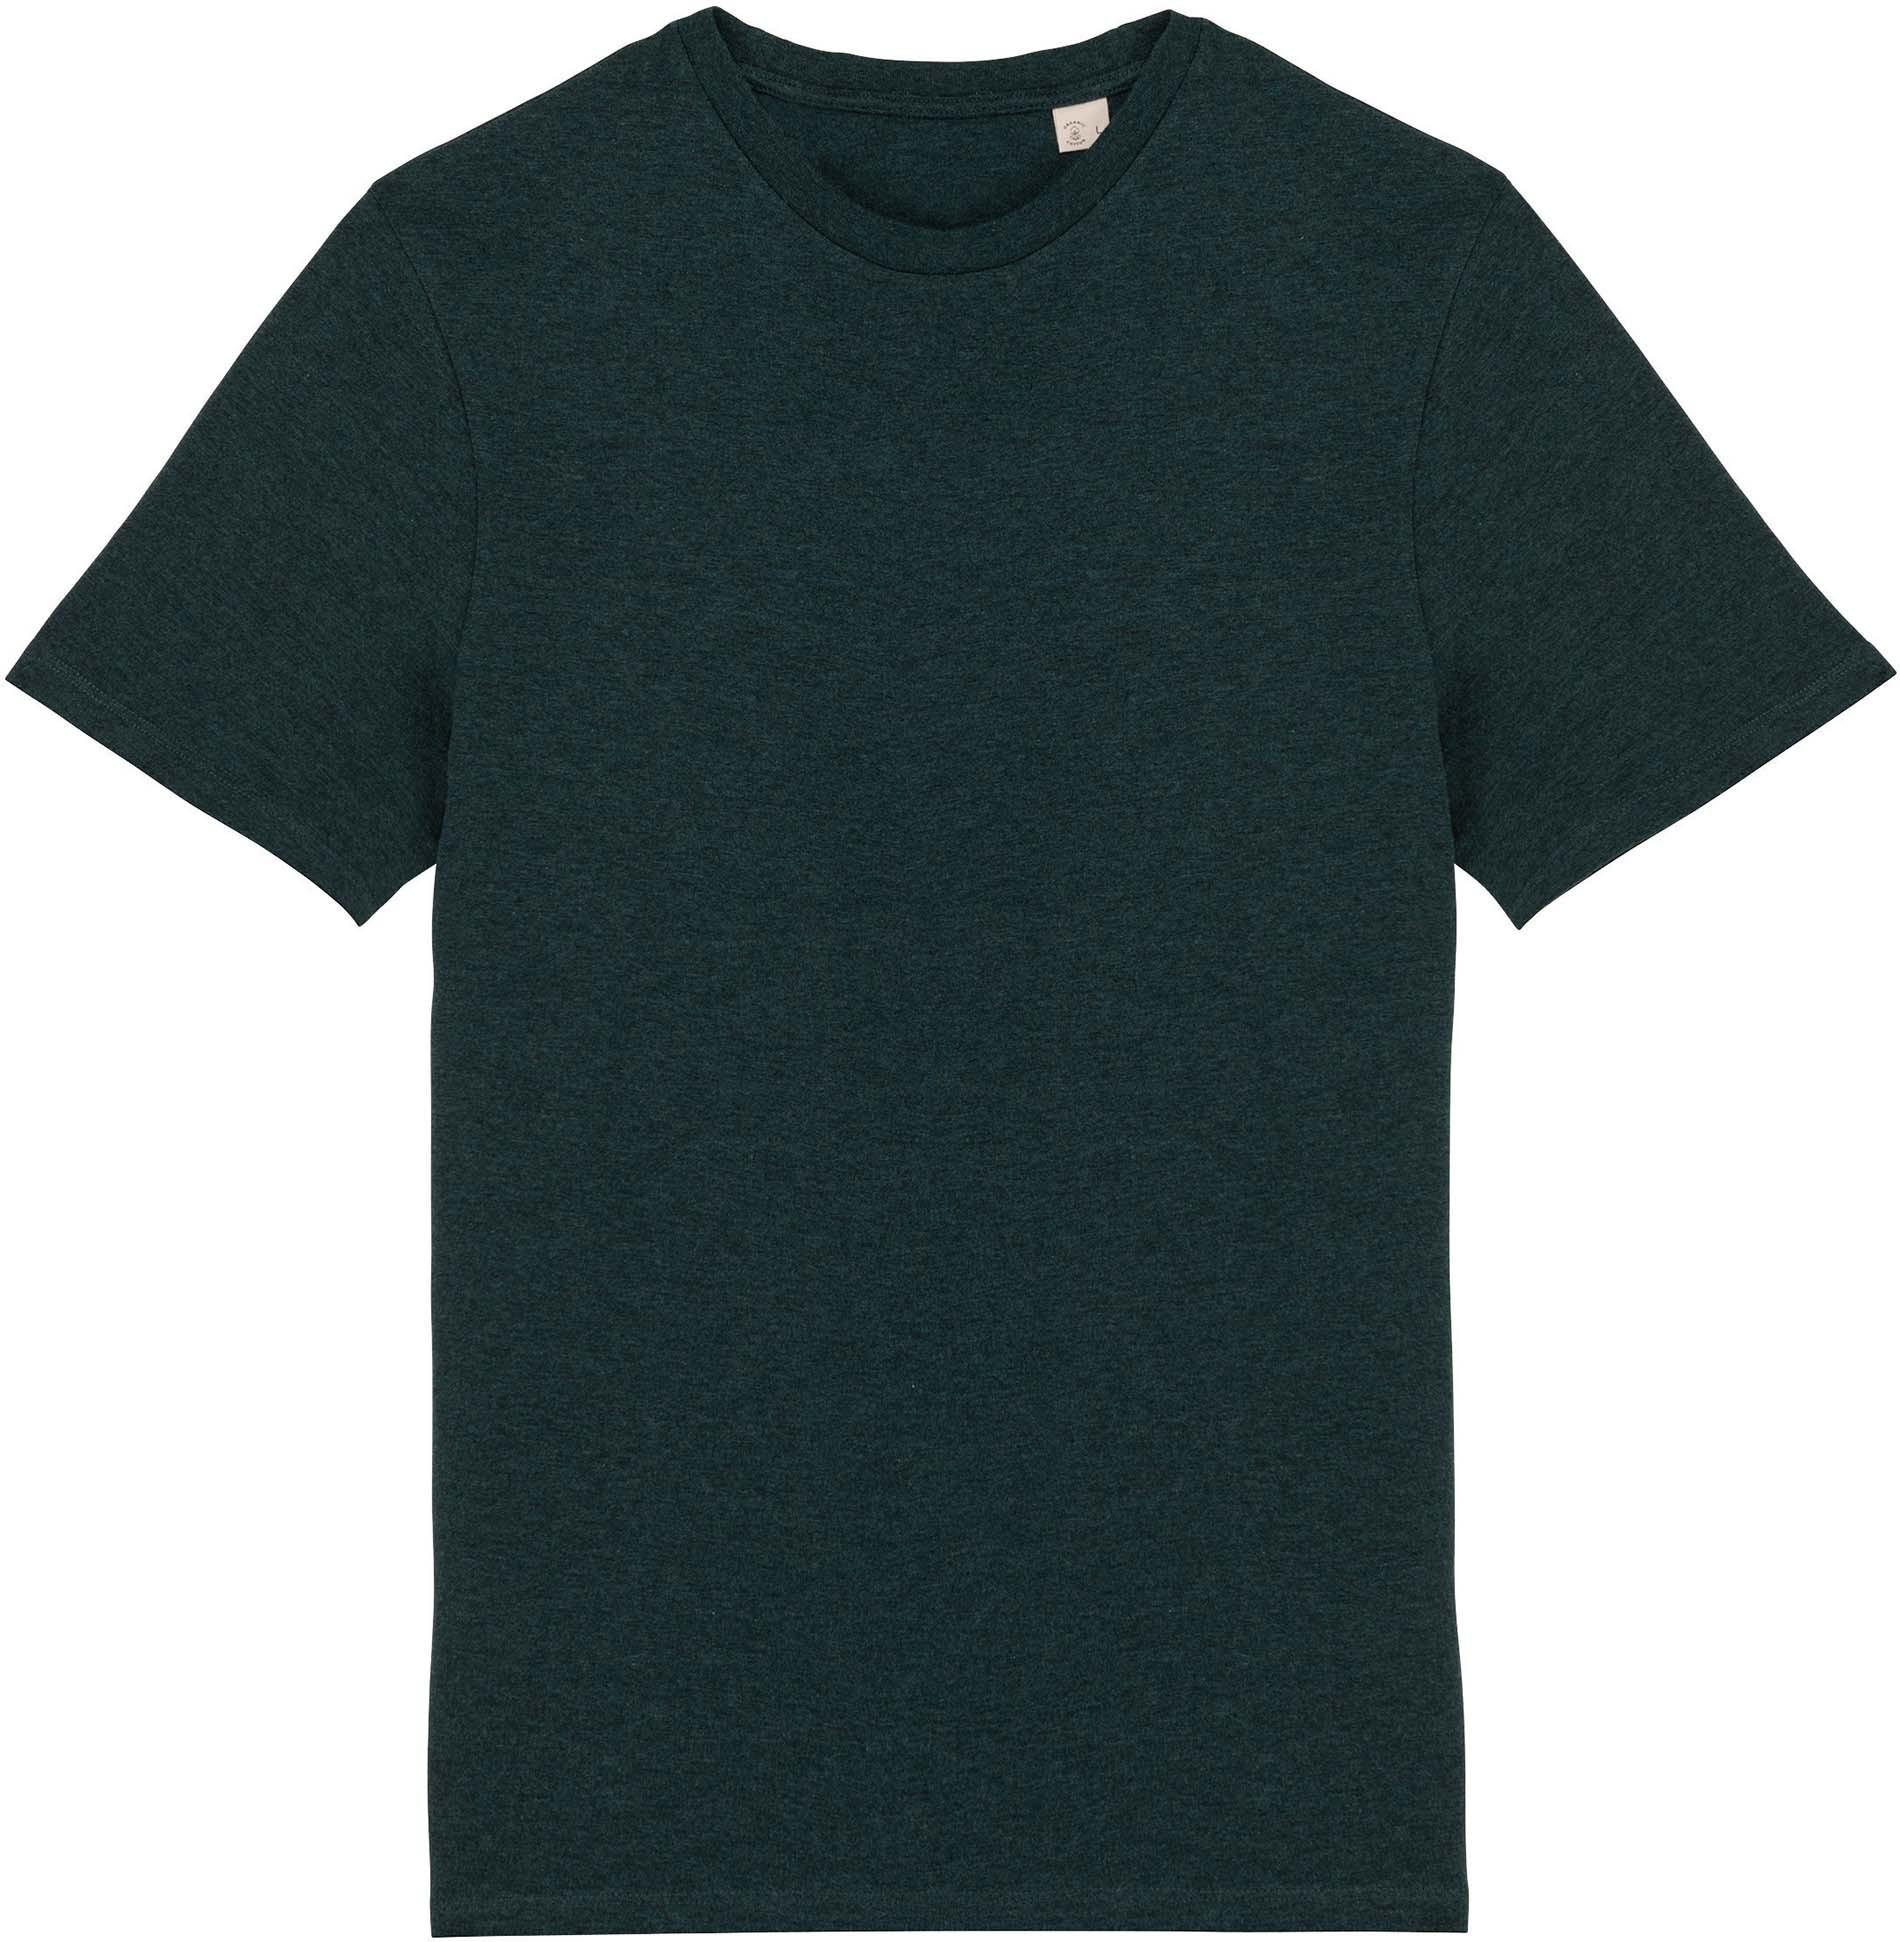 Tee-shirt manches courtes unisexe - 2-1843-9